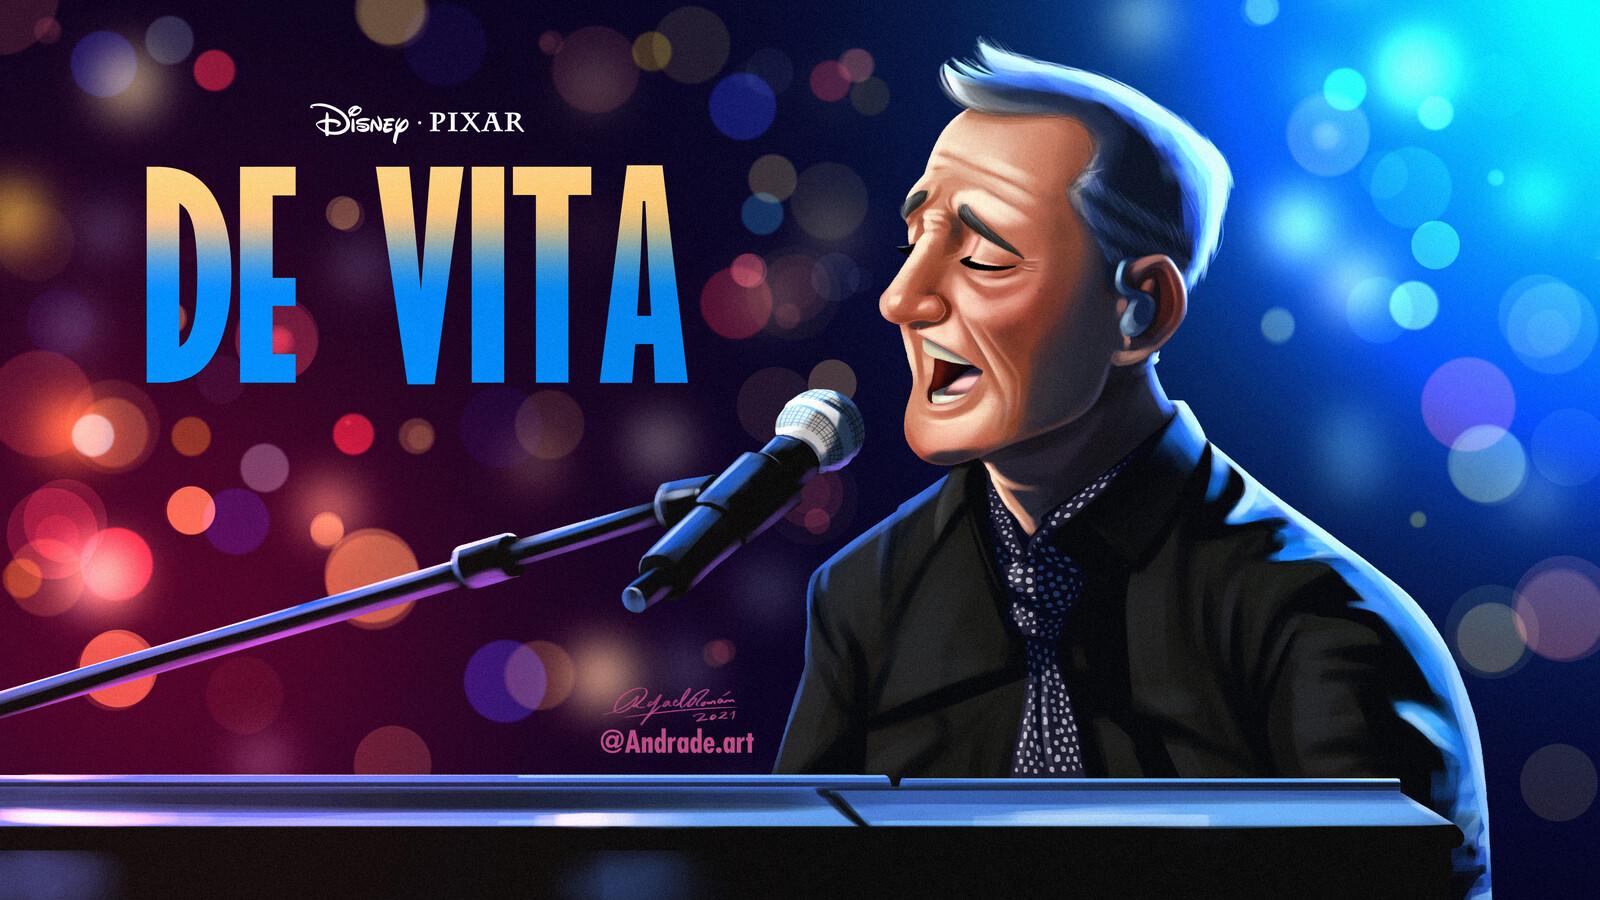 Franco De Vita Movie Concept